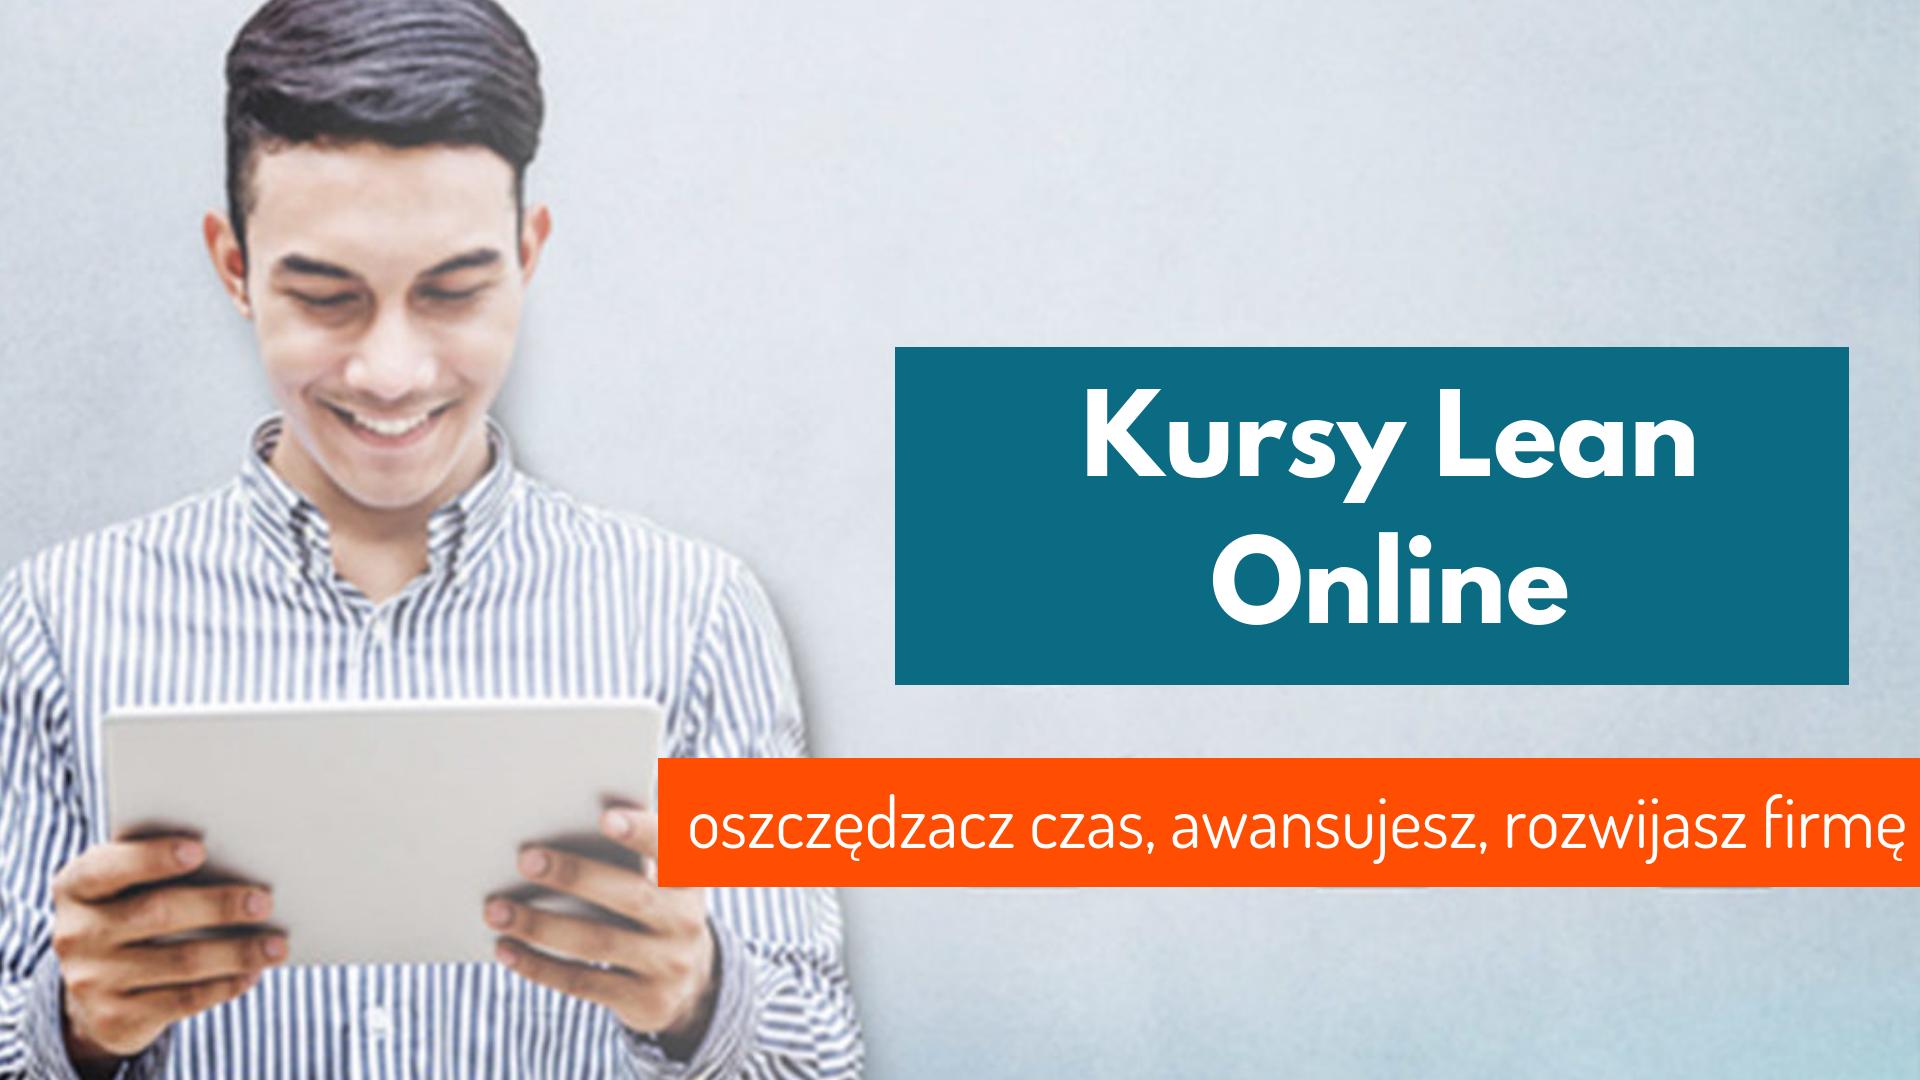 Kursy Lean Online Szkolenia Lean Management przez Internet